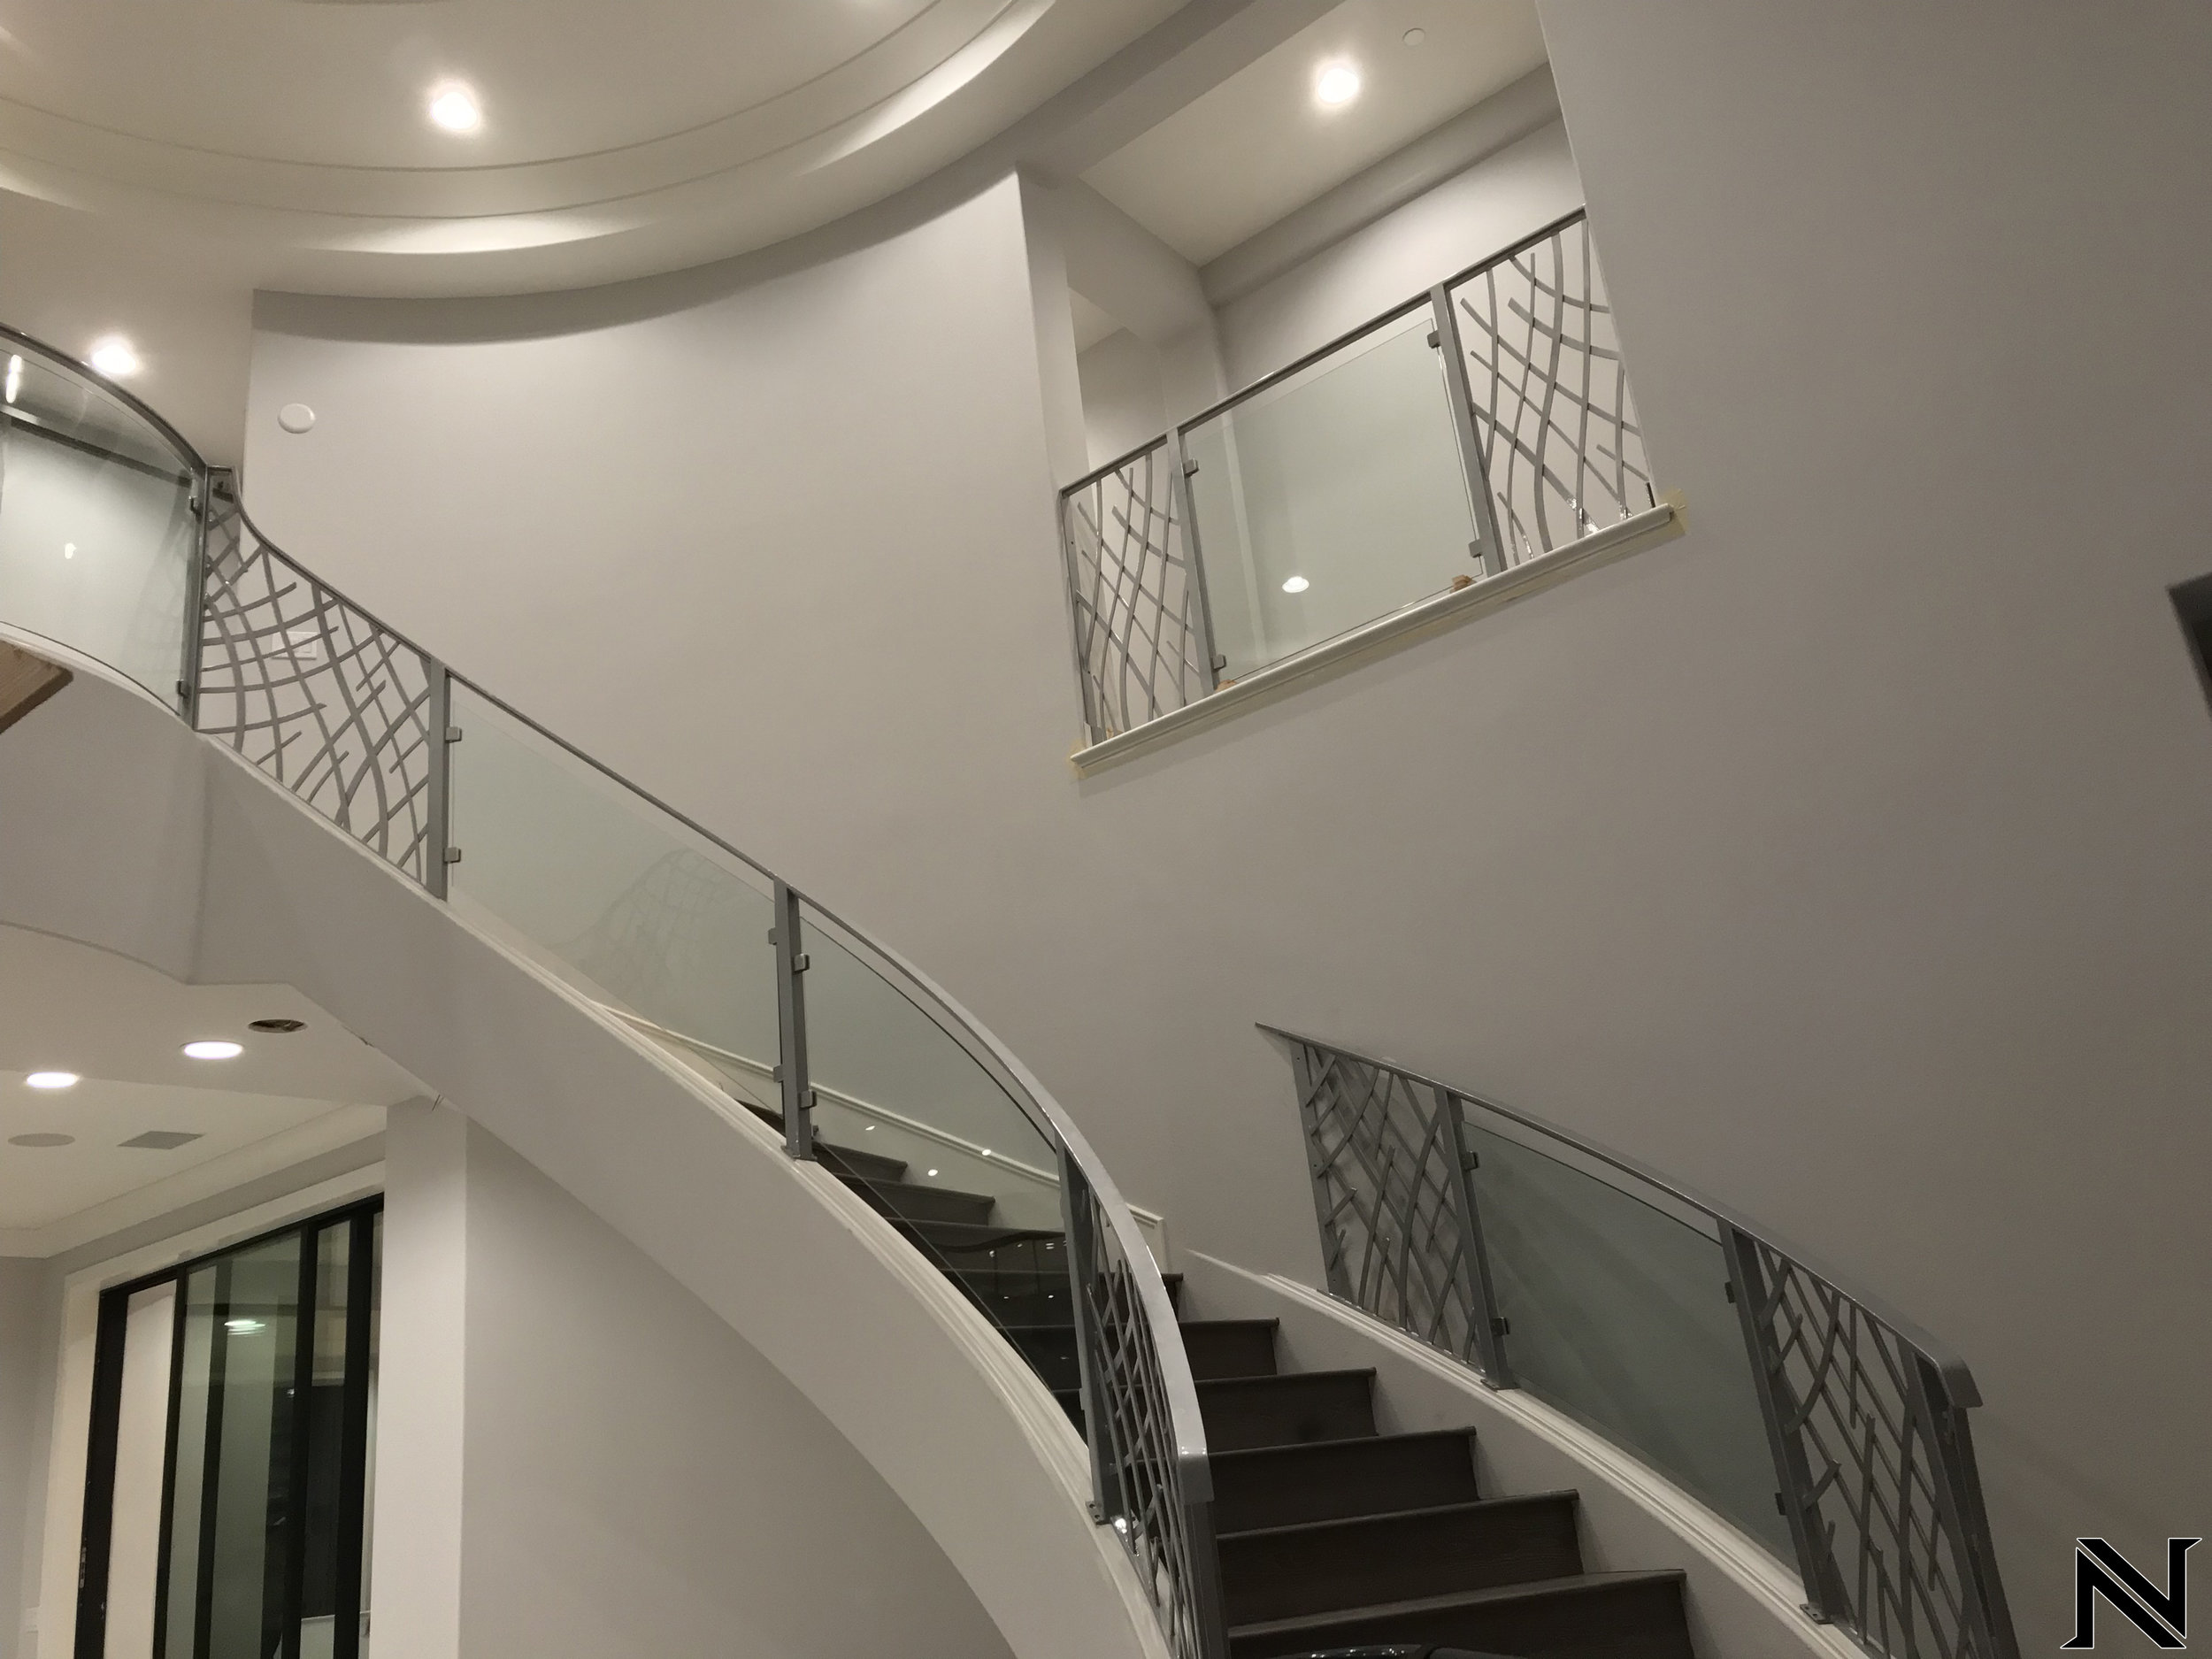 Metallic 'Loose Meshwork' Railings with Sleek HandrailStaircase Railings Design Ideas Naddour's Custom Metalworks